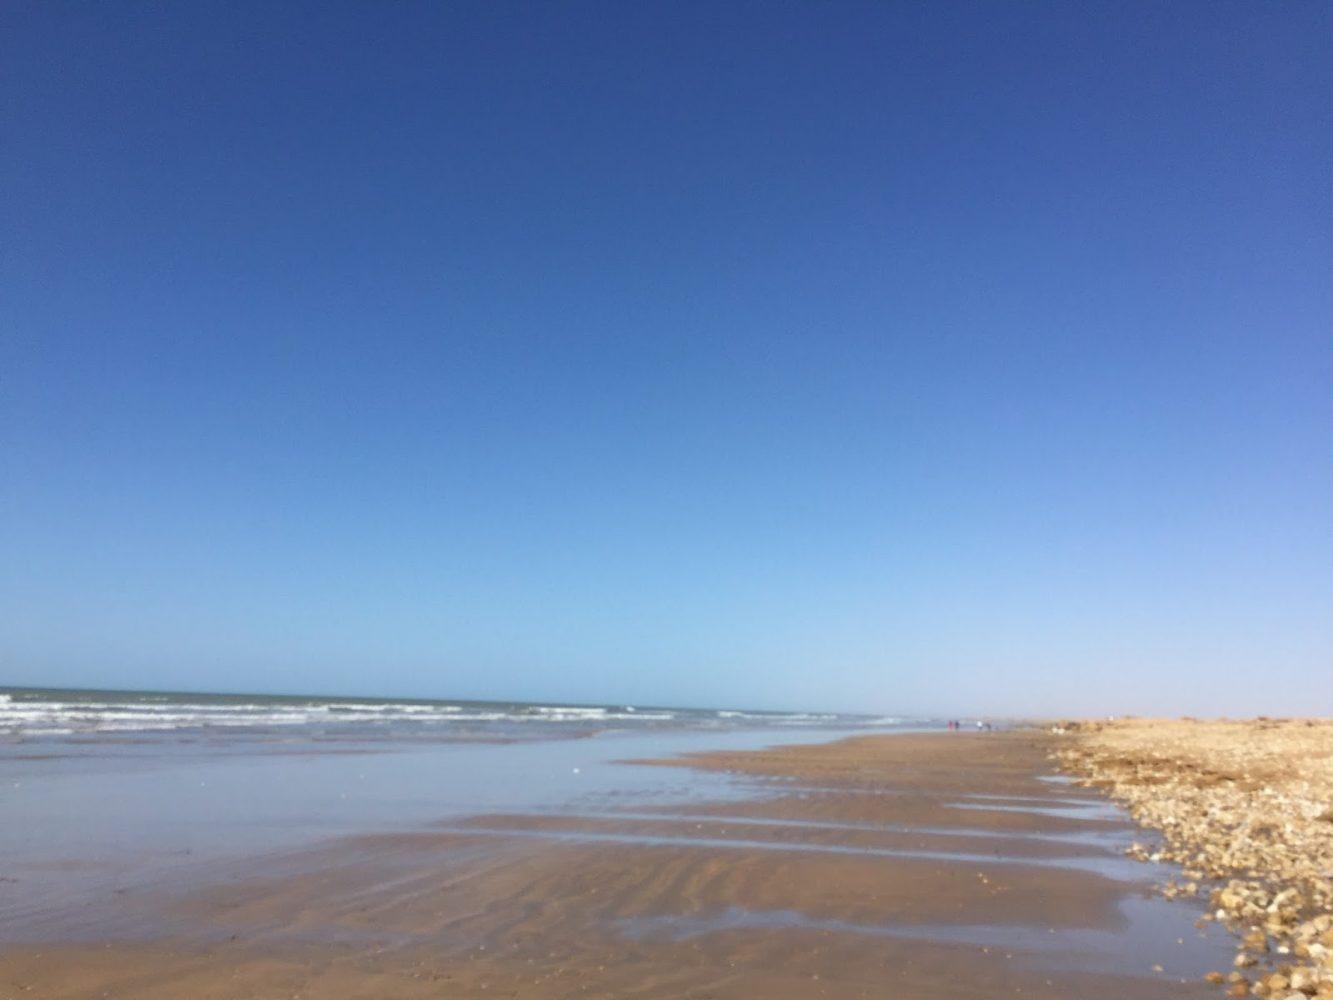 Western Sahara meets the Atlantic Ocean